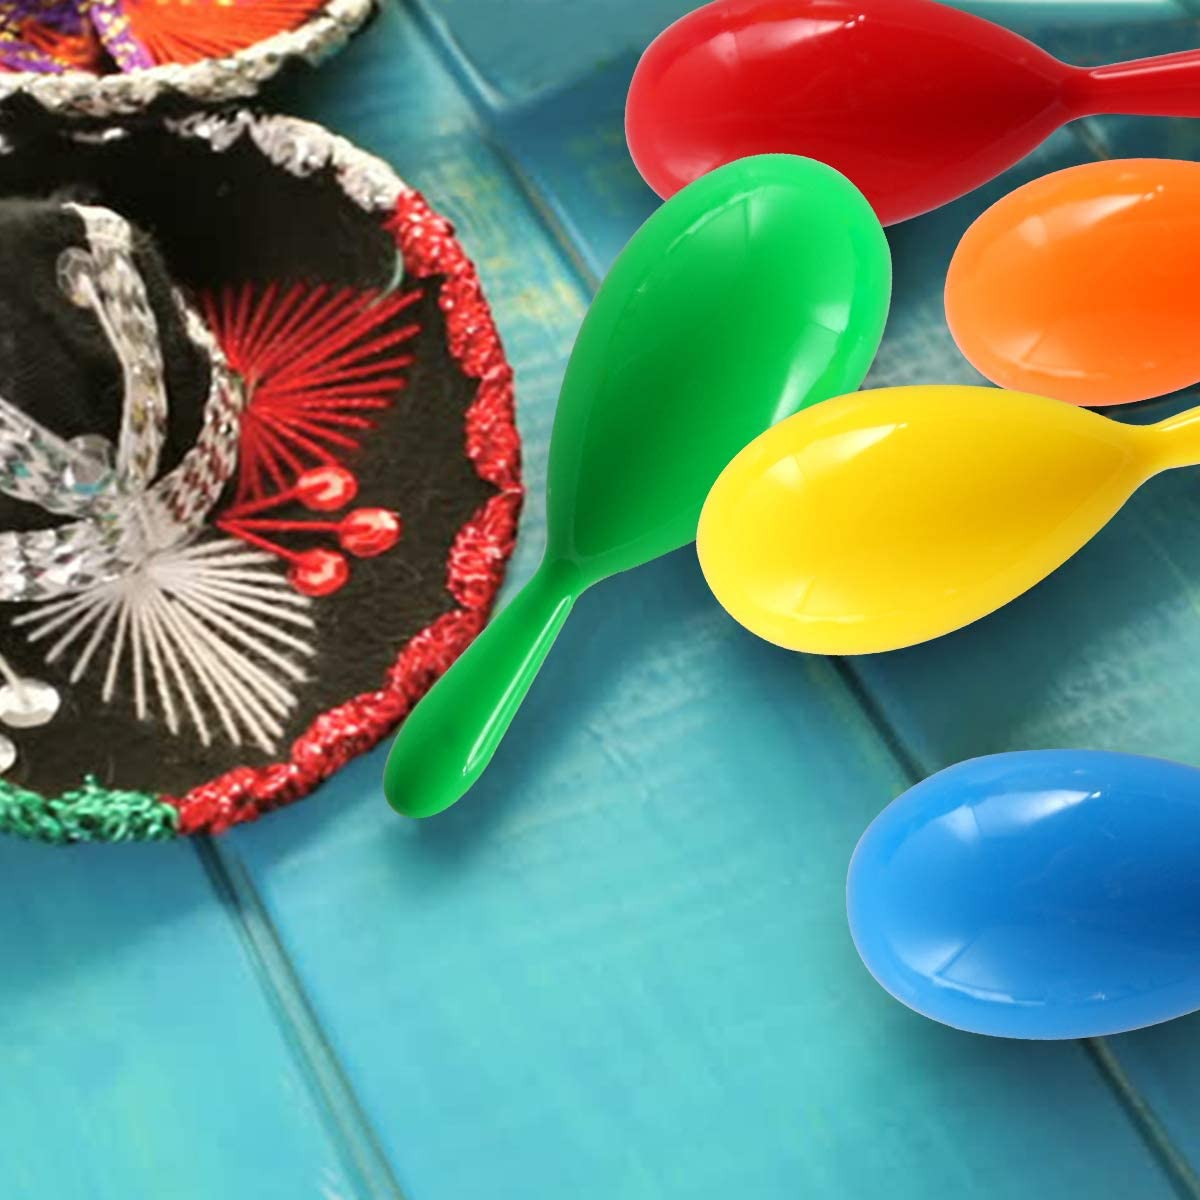 6 Colors 4 Maracas Toys for Cinco de Mayo Partys Birthday Mexican Maraca Neon Colorful Maracas Bulk for Fiesta Party Favors Baby Noisemaker Maracas for Kids 32 Pack Fiesta Decorations